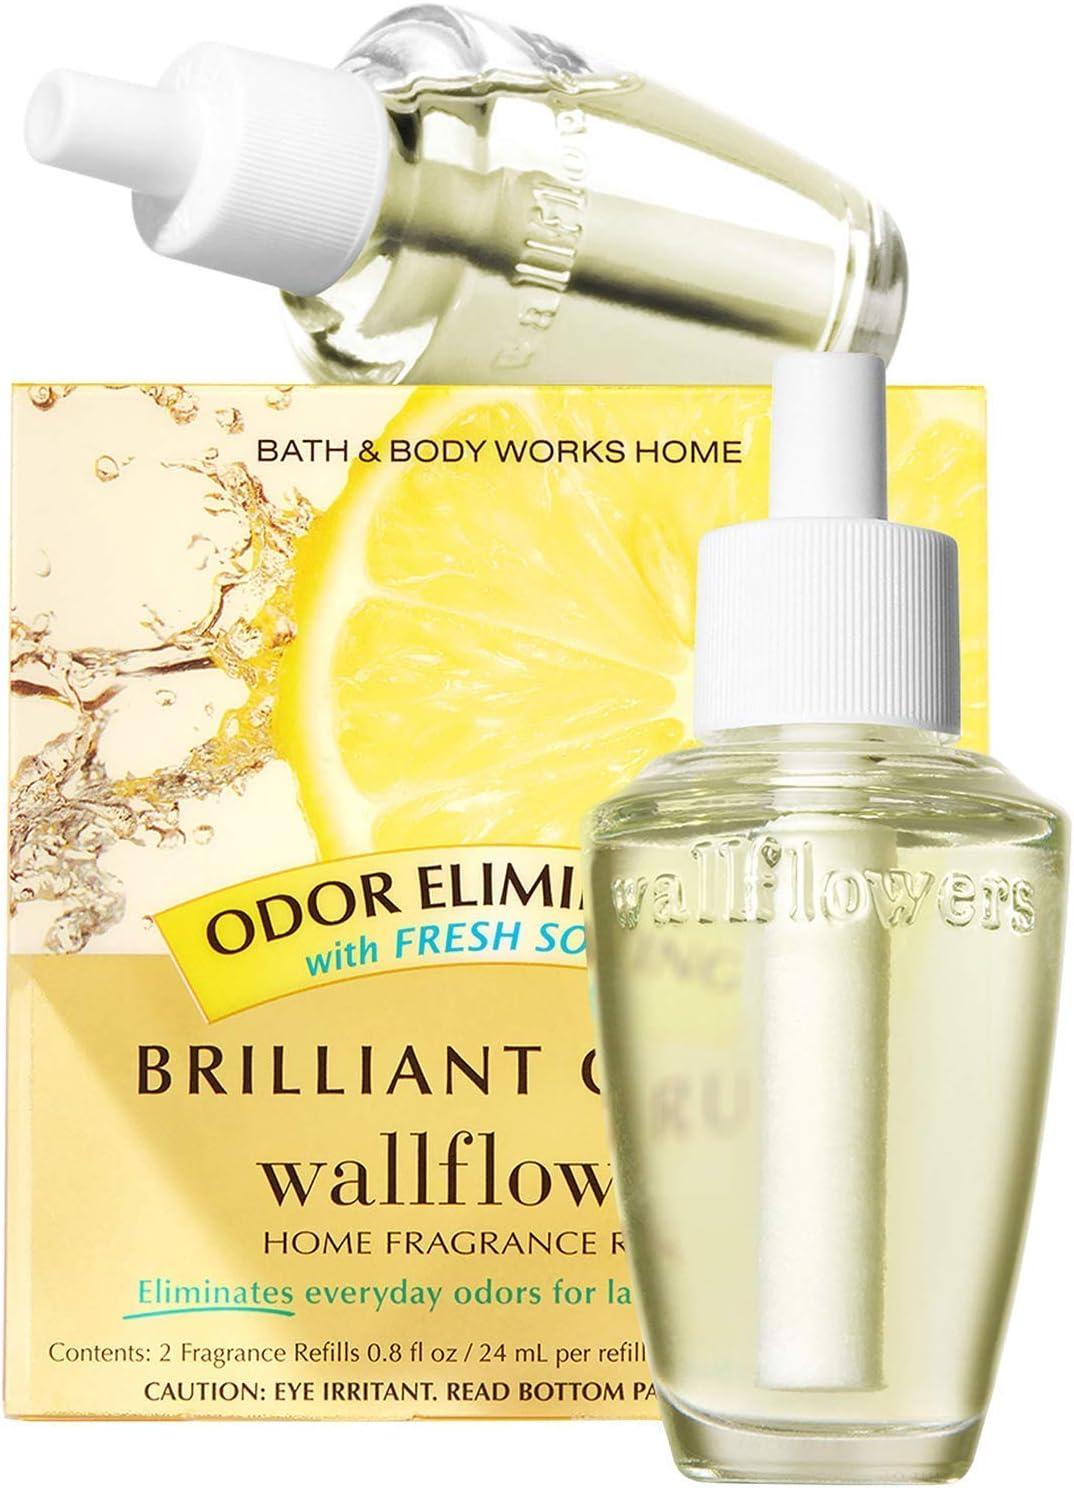 Bath & Body Works Brilliant Citrus Odor Eliminating Wallflowers Home Fragrance Refills, 2-Pack